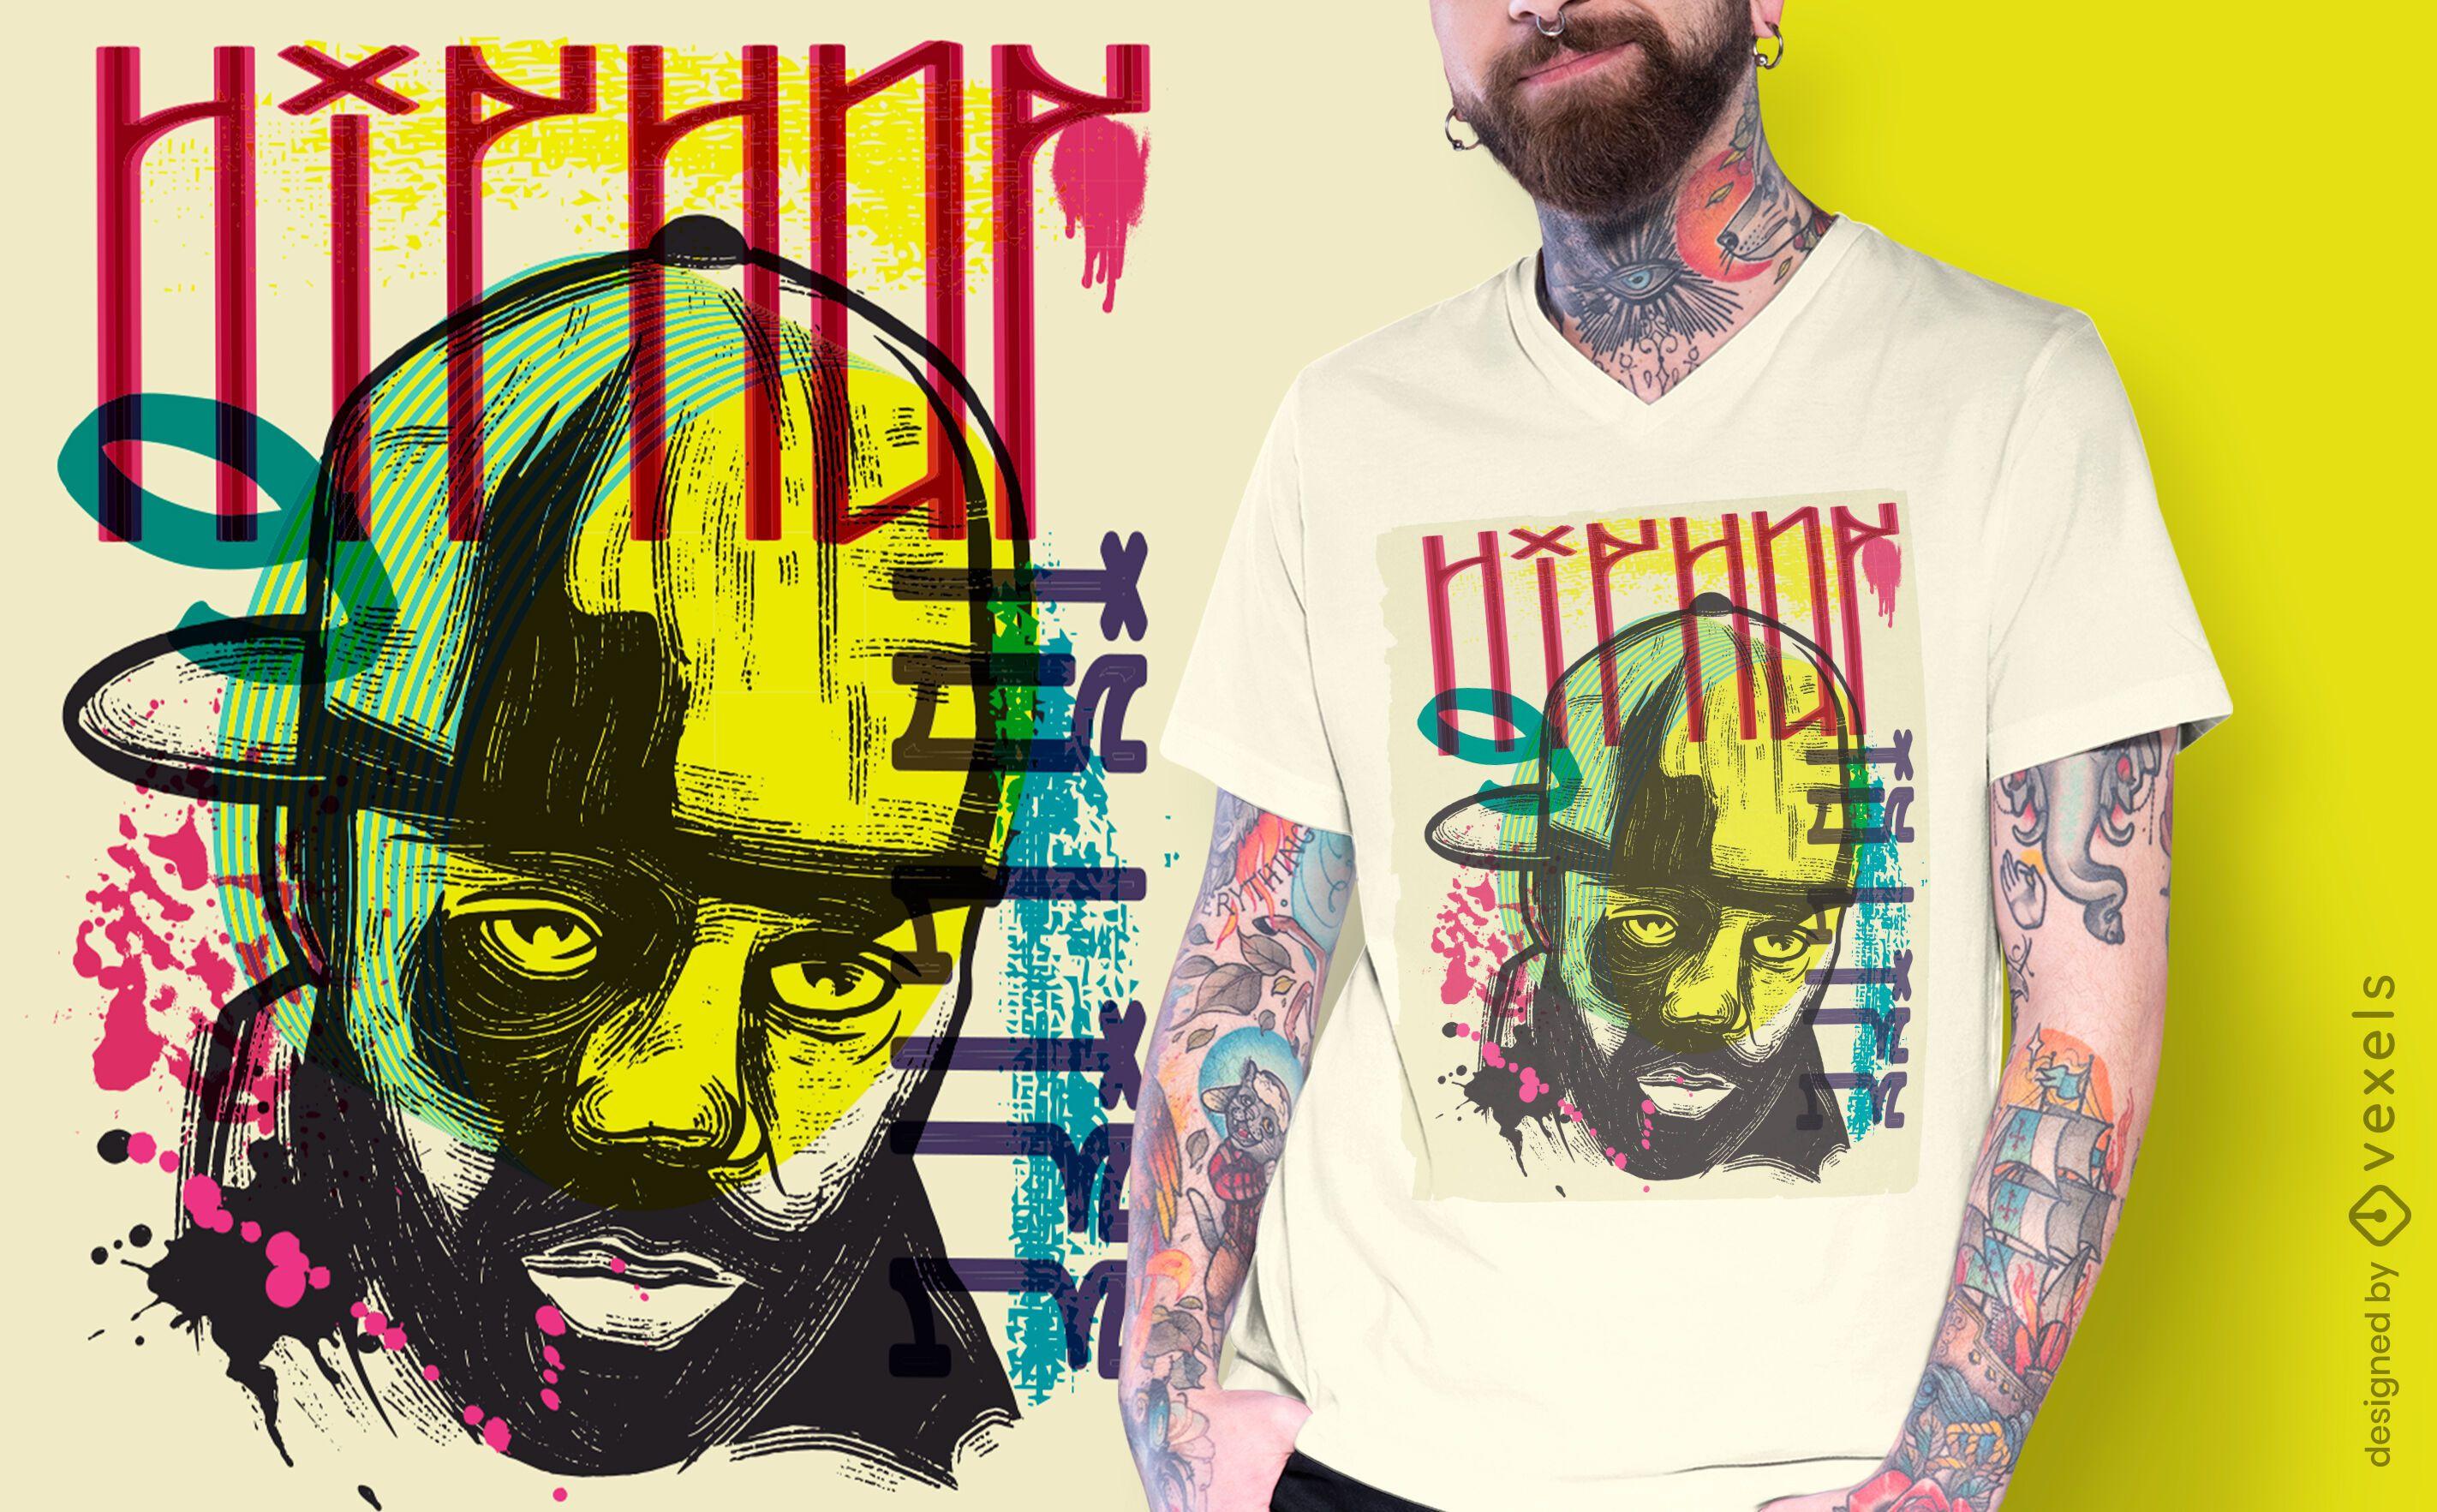 Rapper urban graffiti t-shirt design